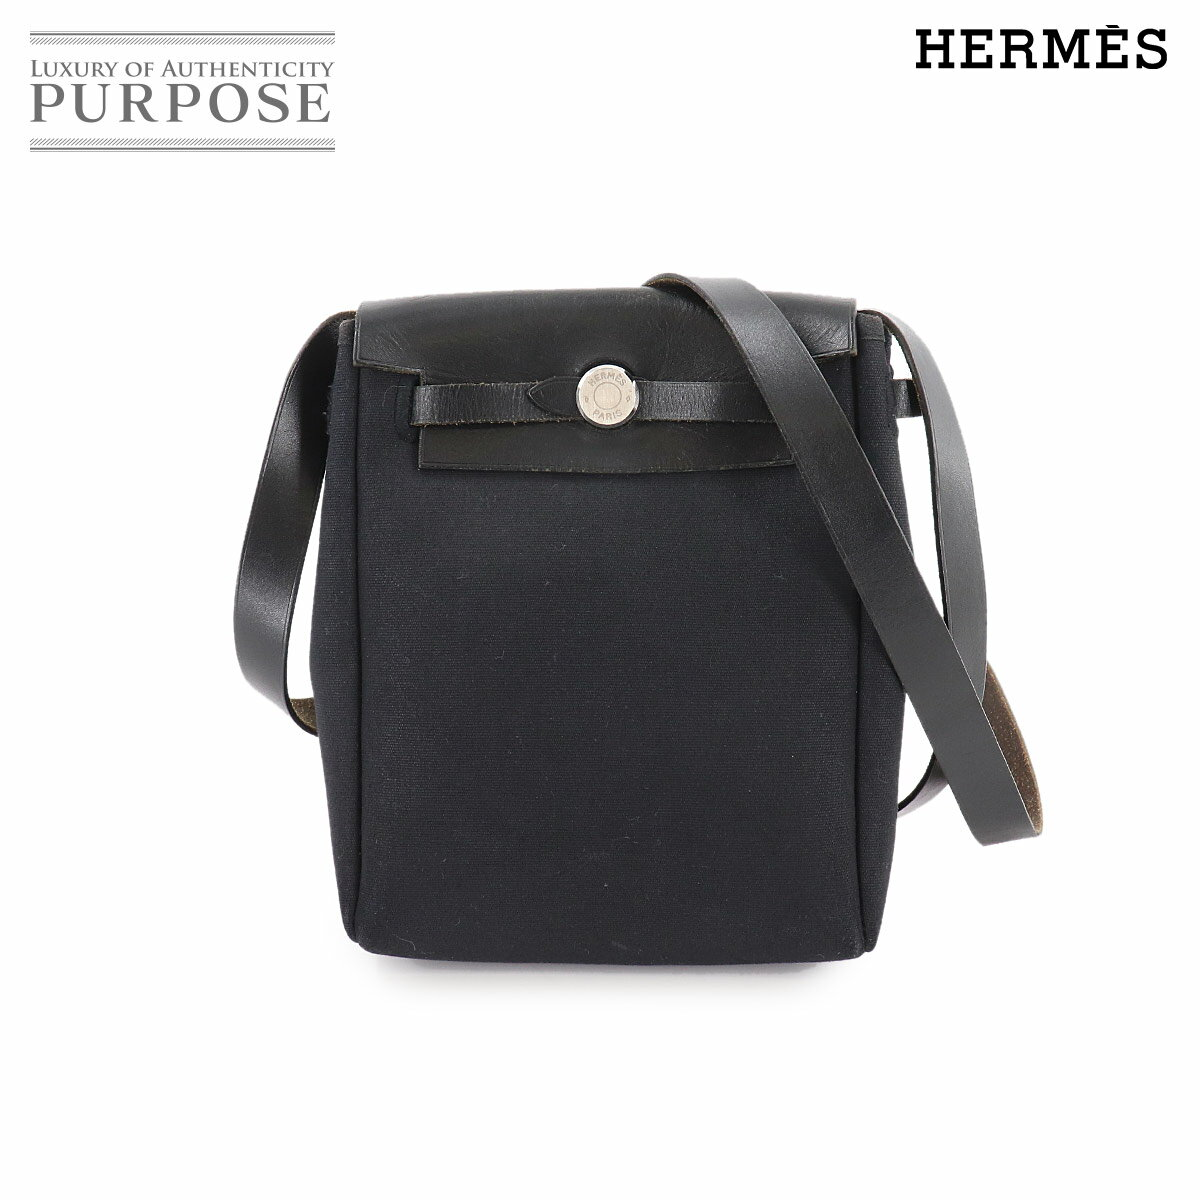 HERMES herbag price HERMES TPM Herbag TPM